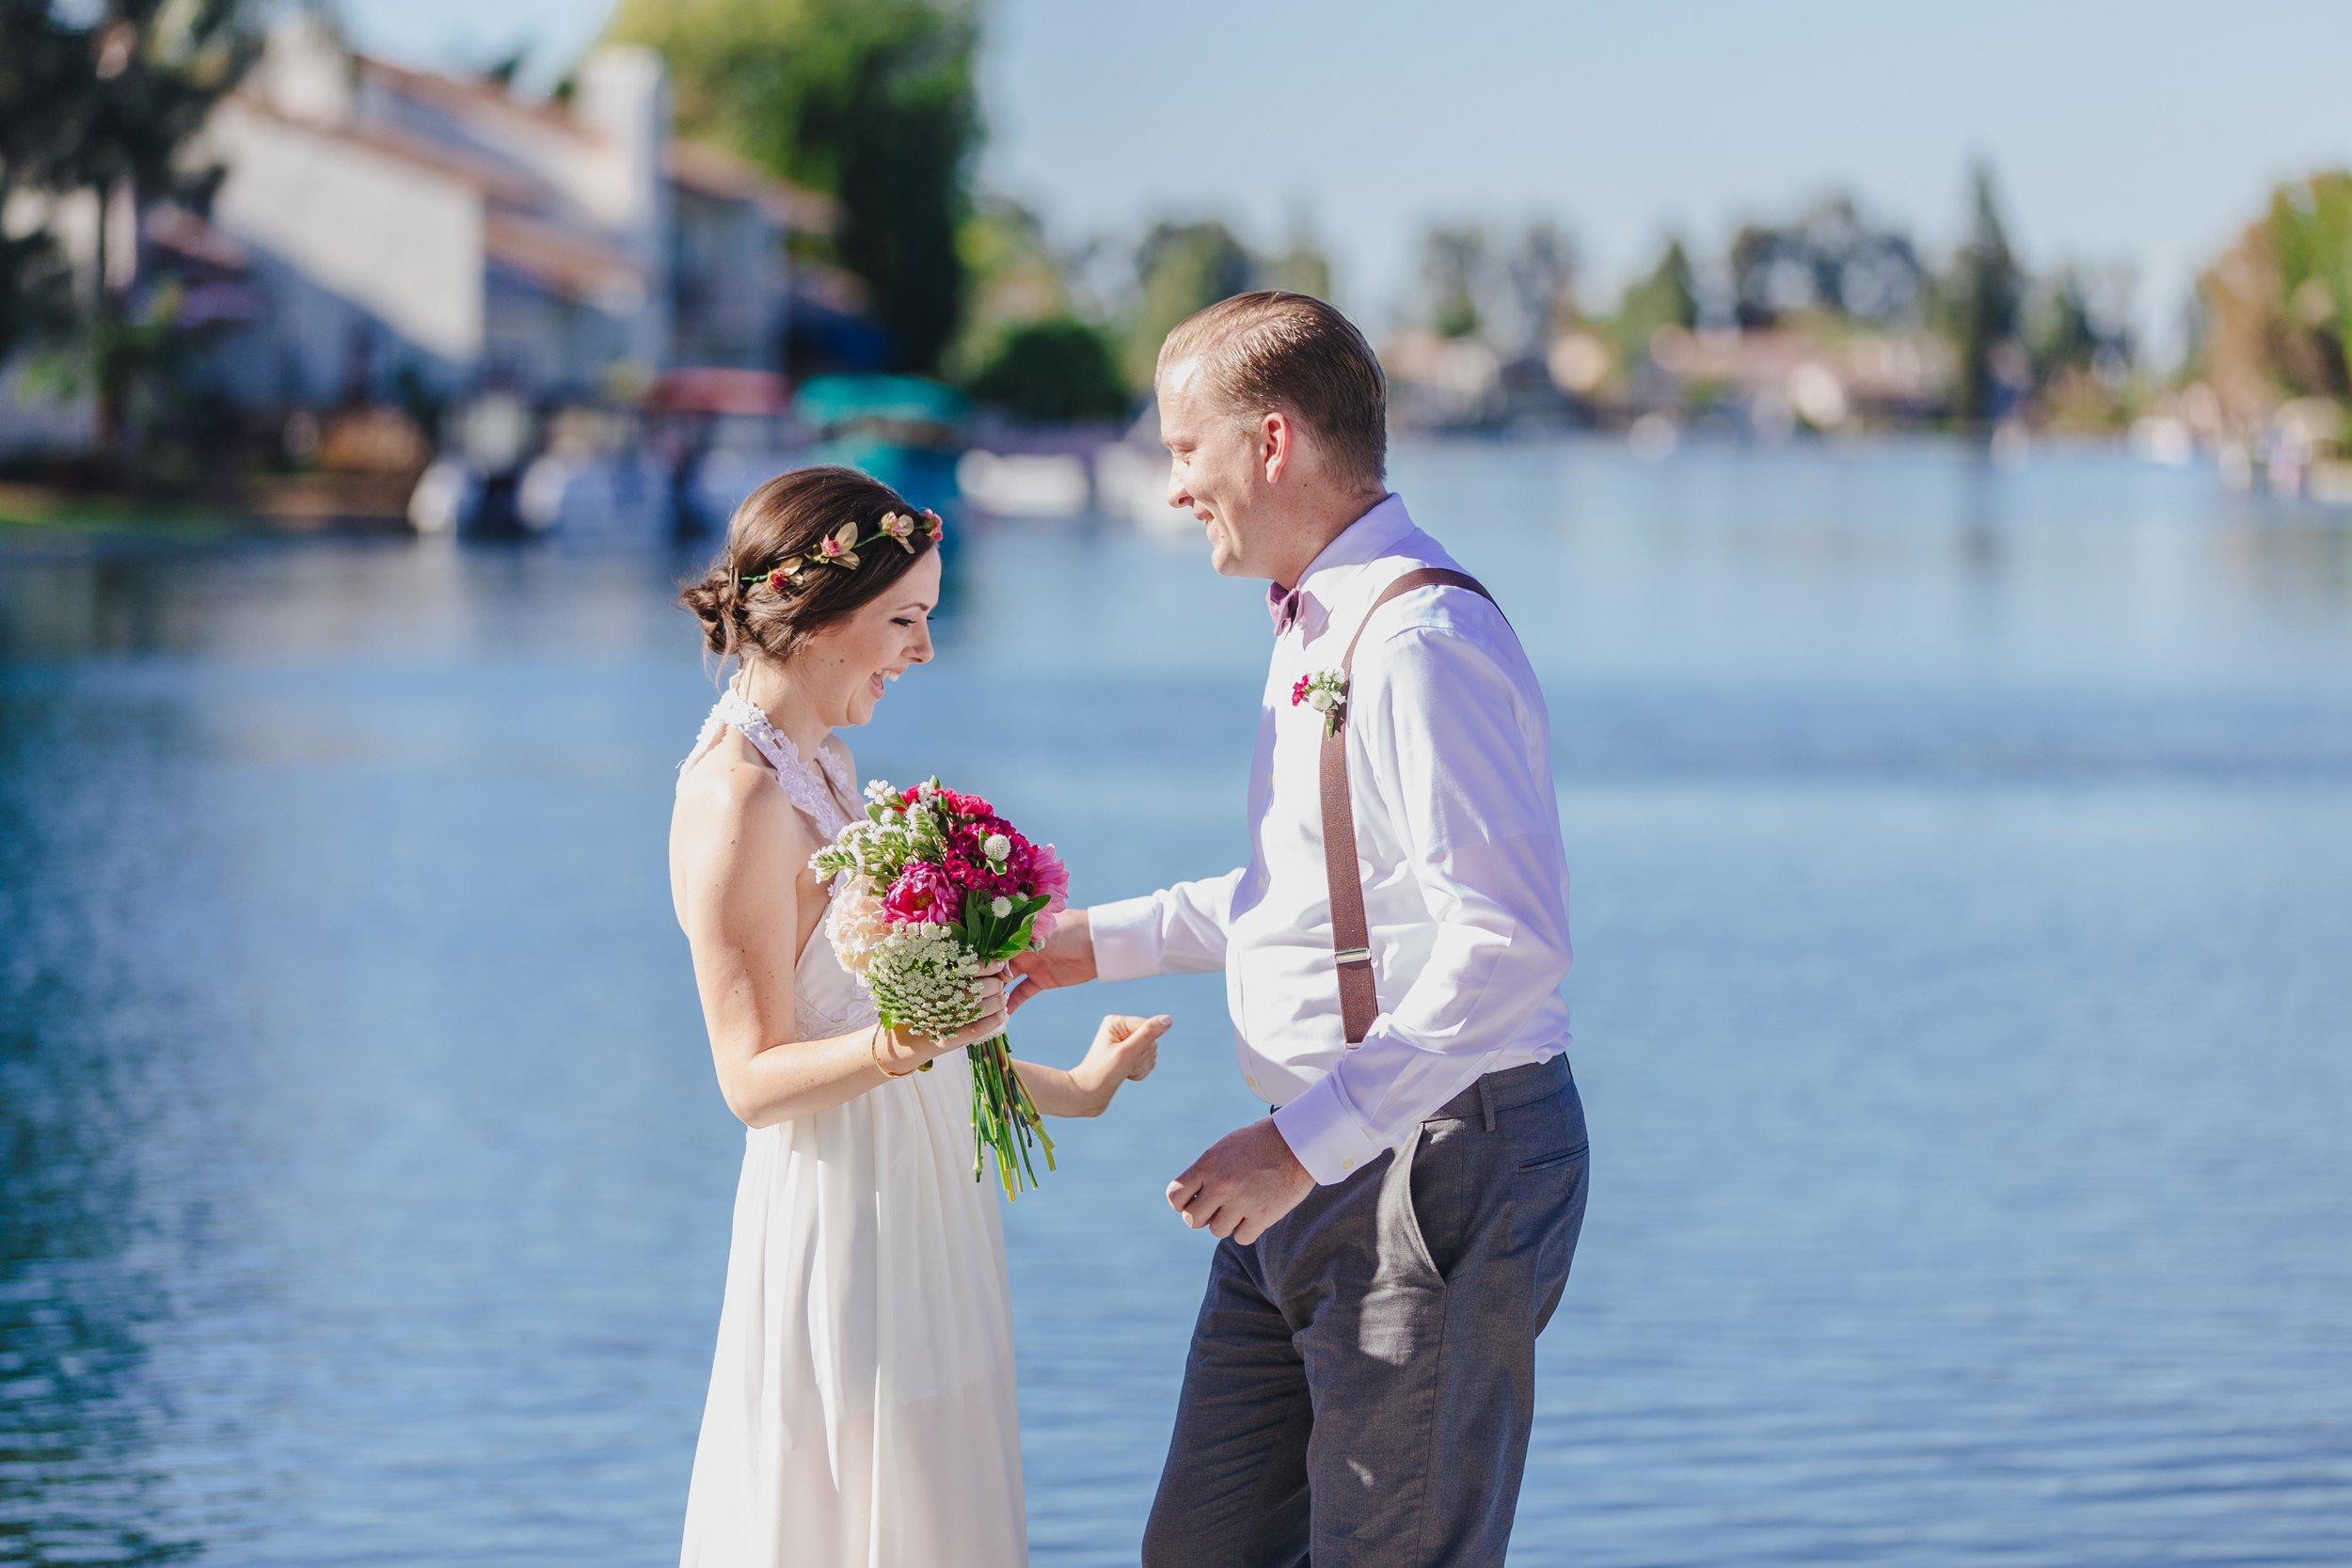 20141024-DePartee-Wedding-APavone-025-sm.jpg